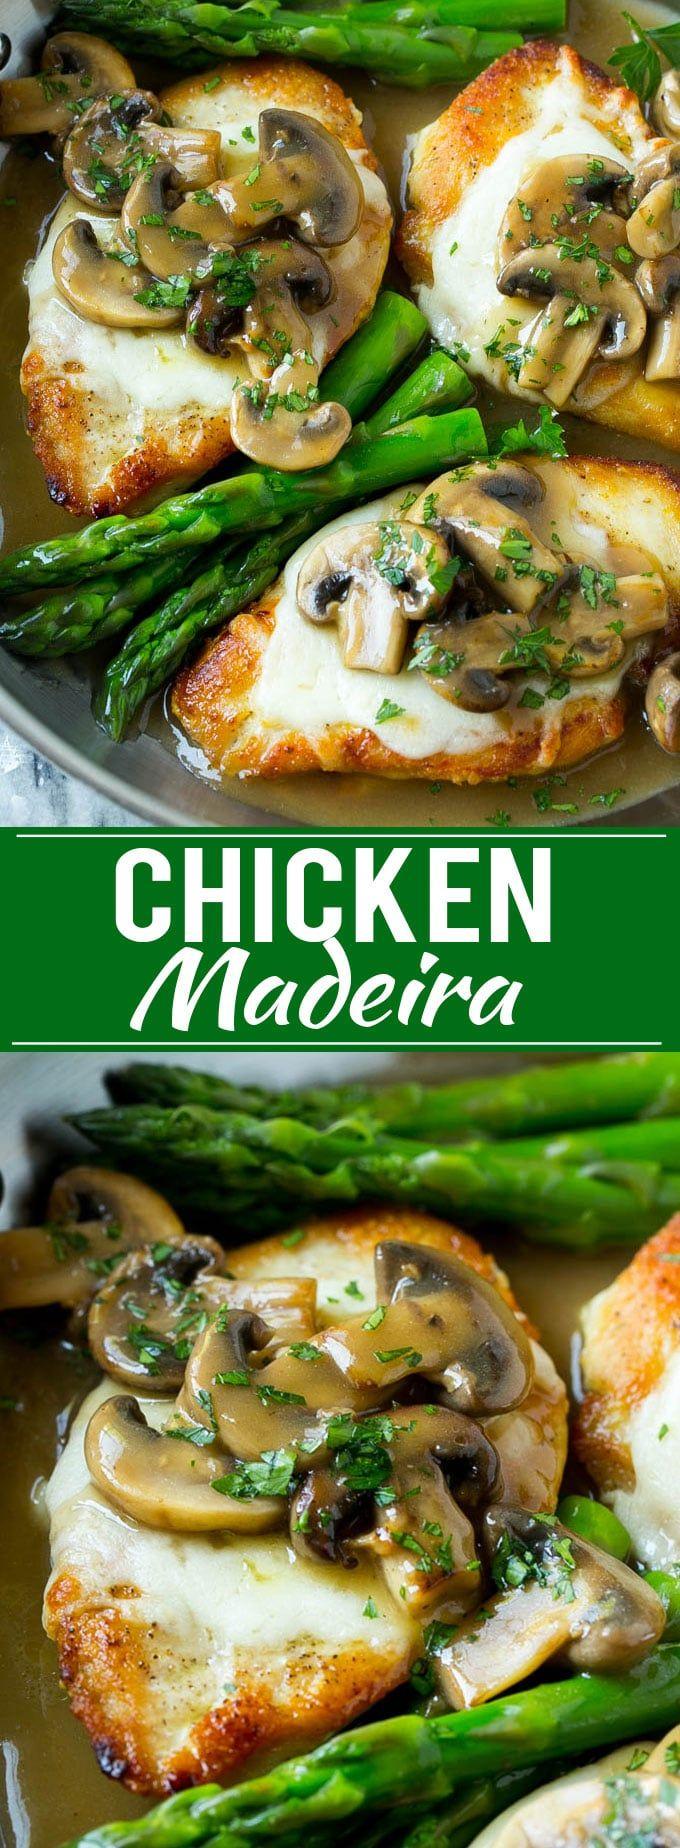 Chicken Madeira Recipe   Chicken with Mushrooms   Cheesecake Factory Copycat Recipe